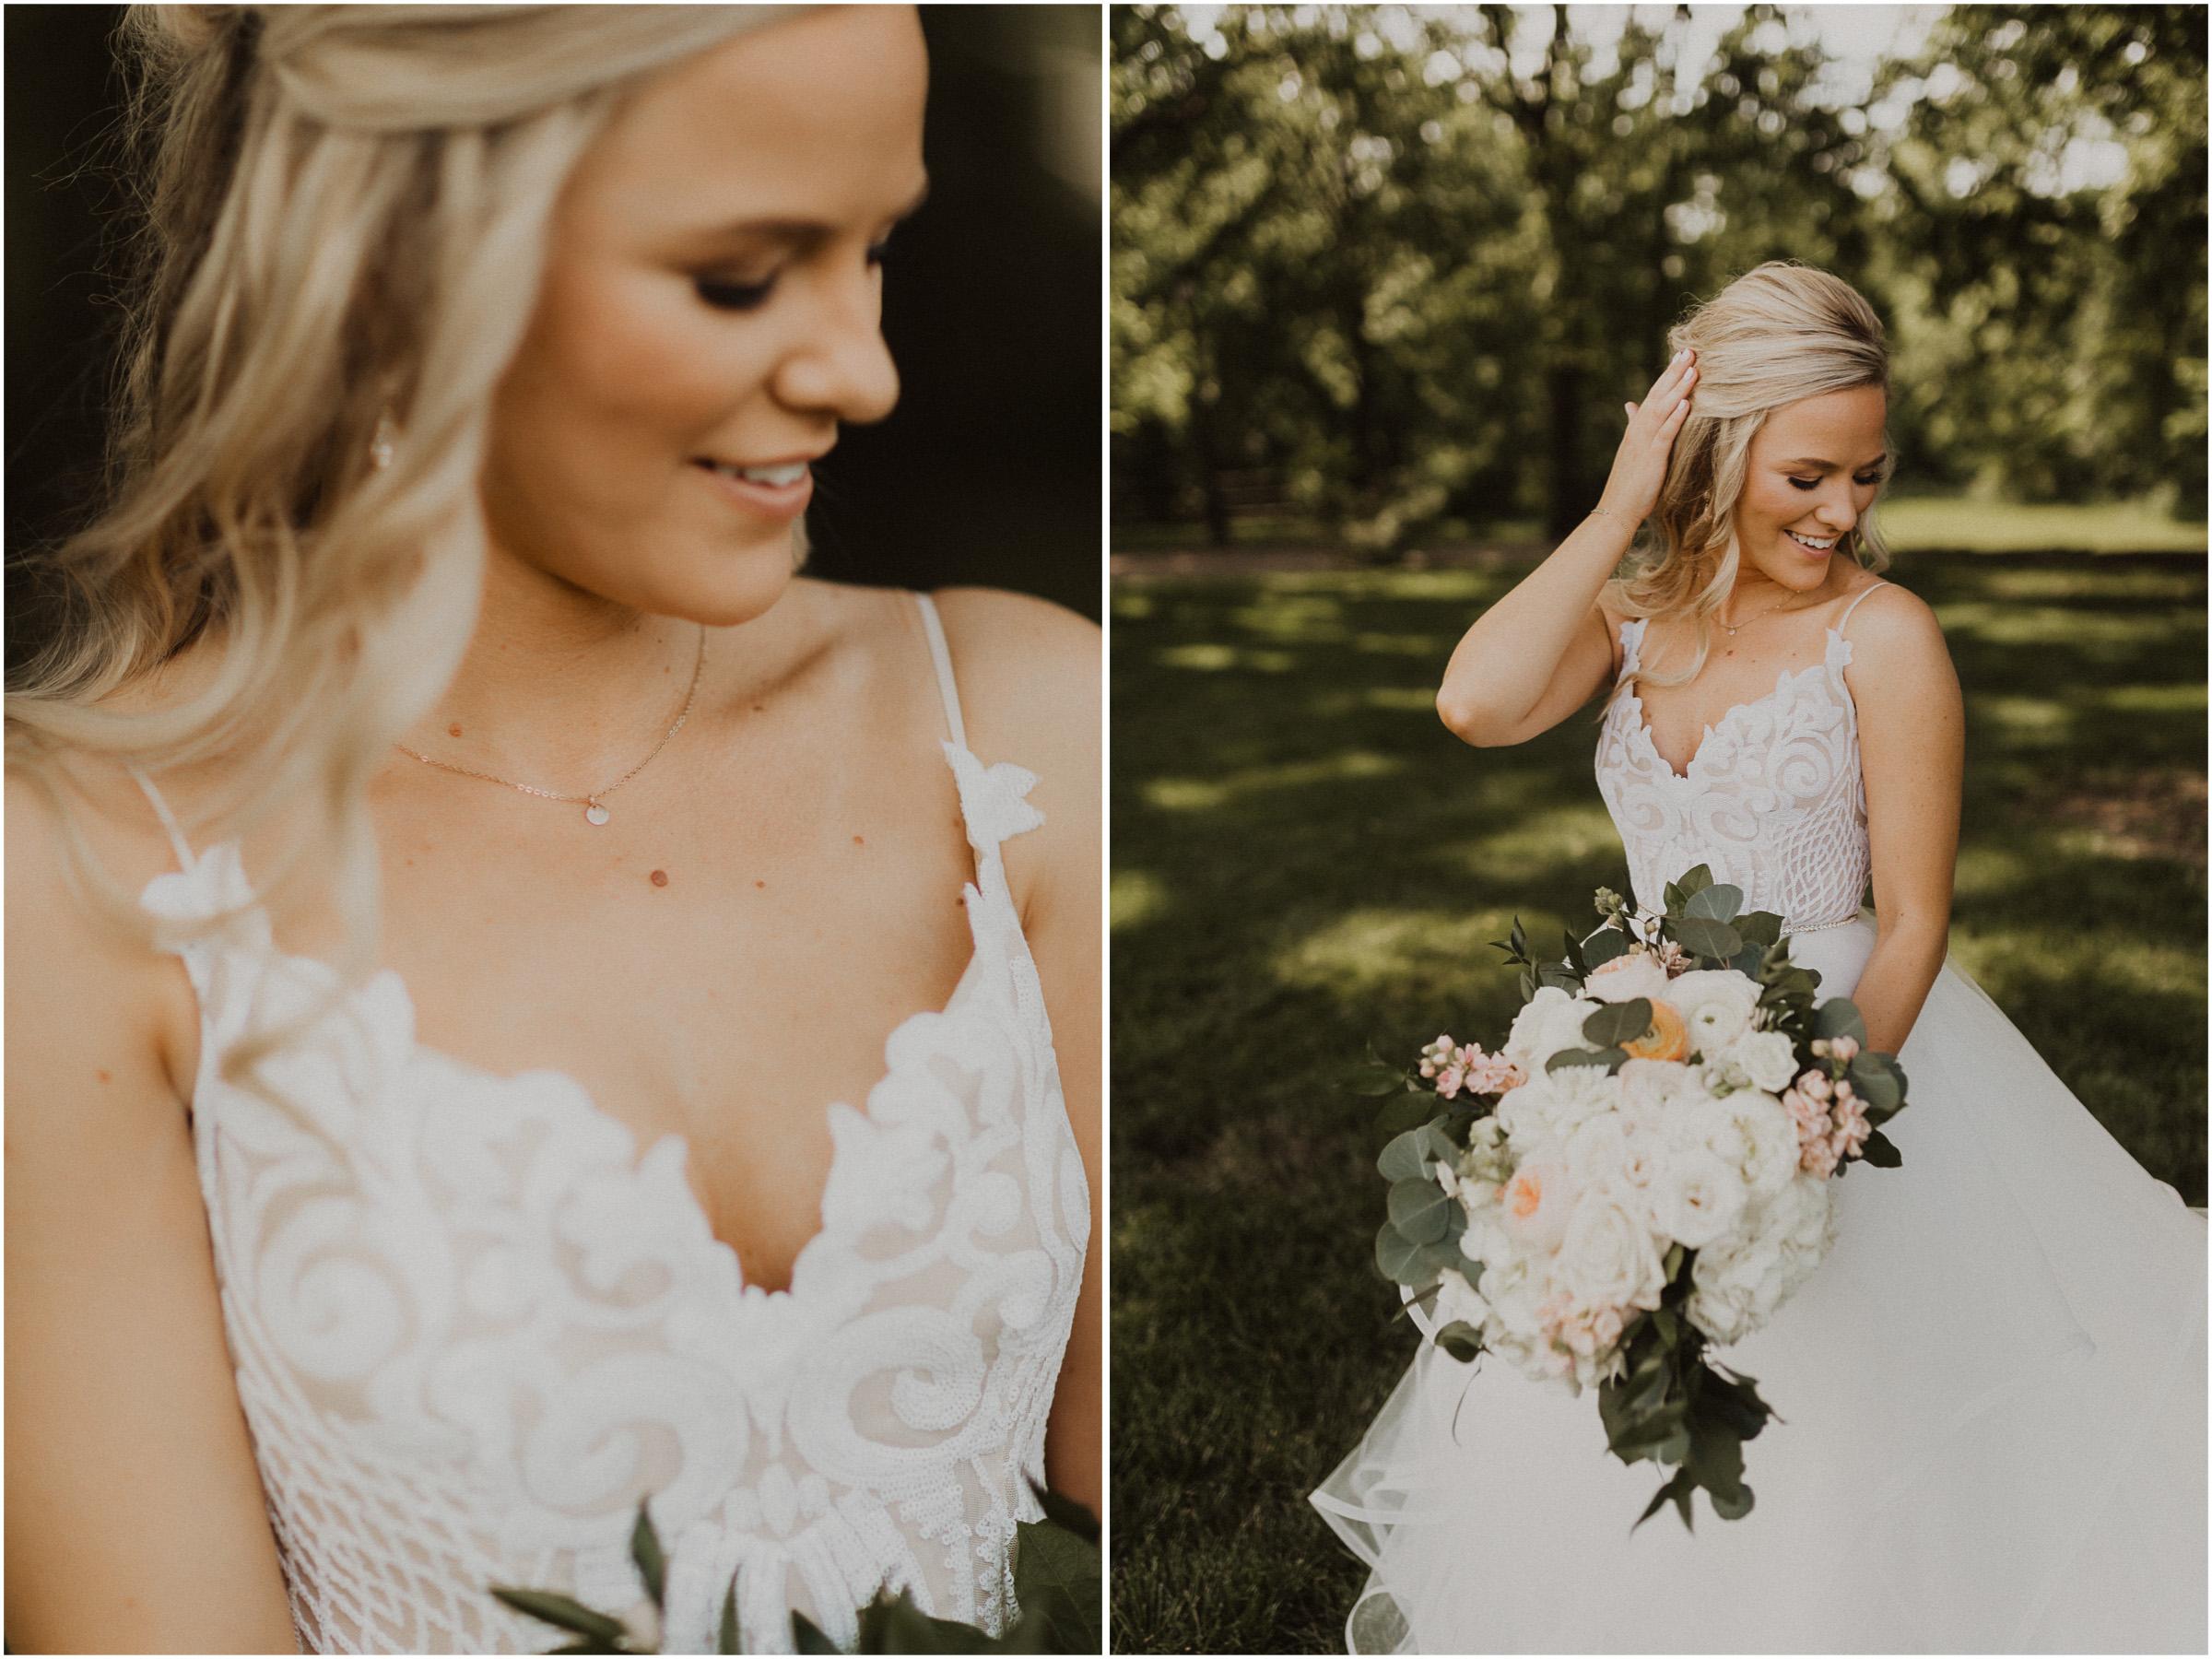 alyssa barletter photography hawthorne house summer outdoor wedding southern charm inspiration-37.jpg